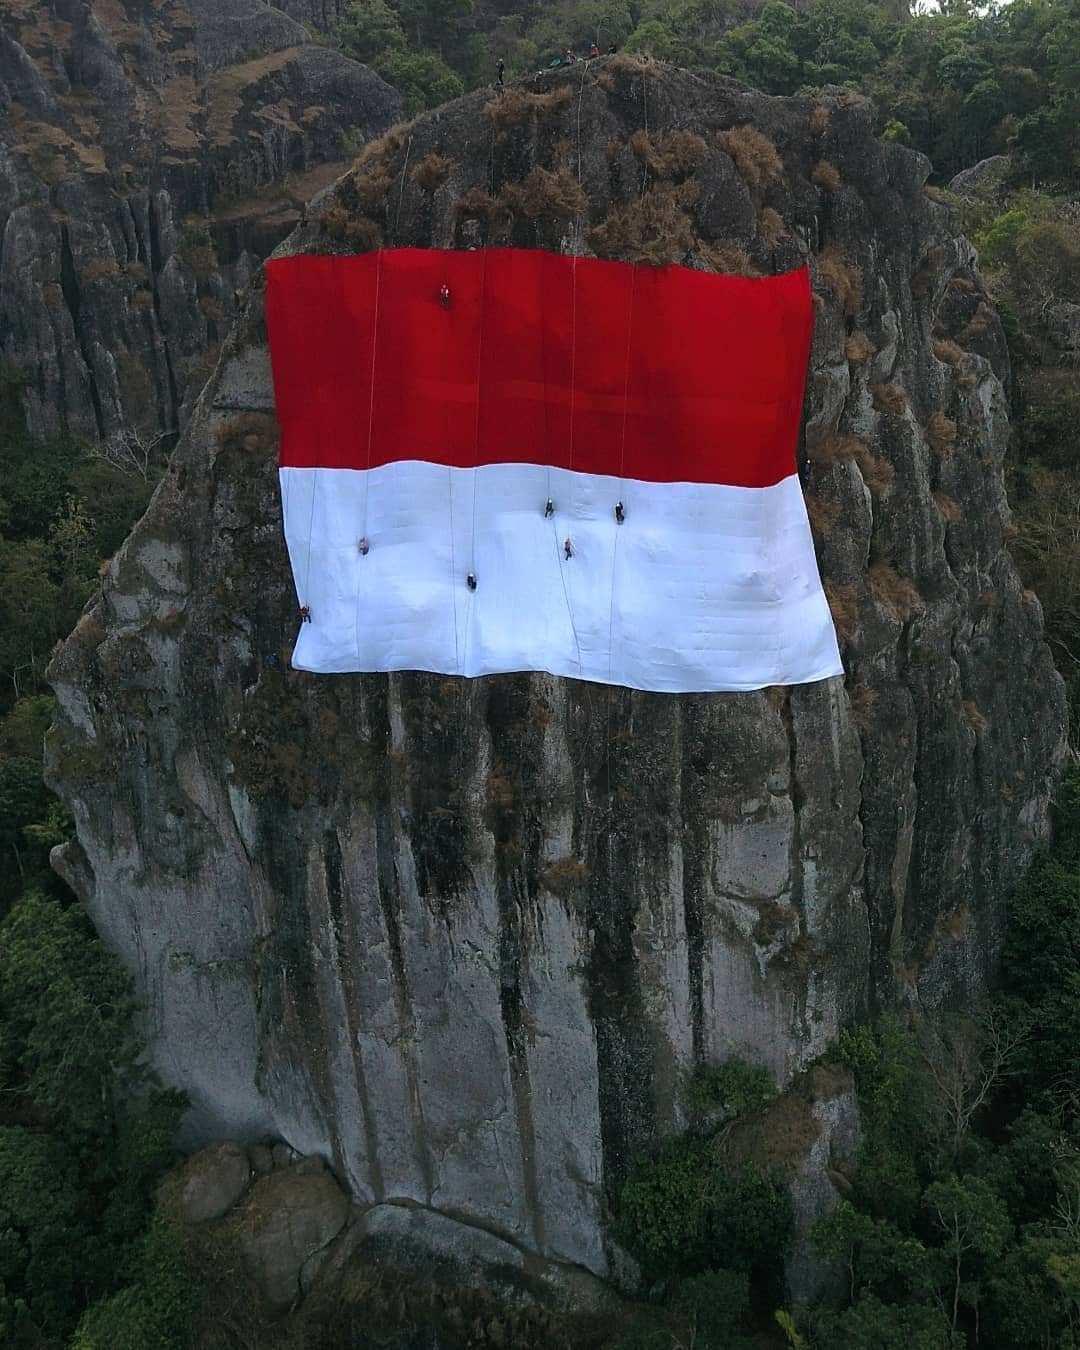 Pengibaran Bendera indonesia di Gunung Api Purba Ngelanggeran, Image From @gandung_mh